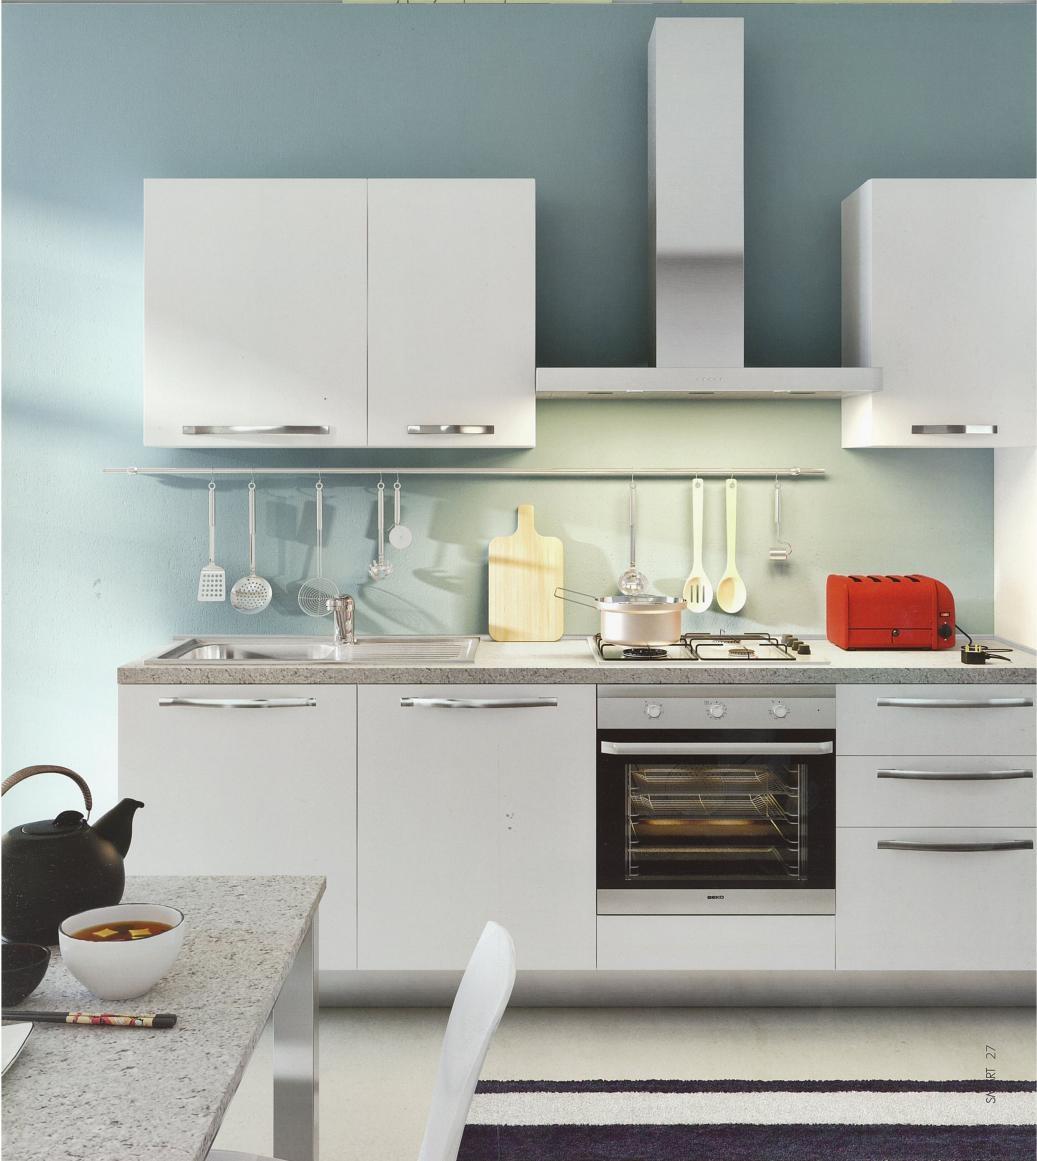 Cucina moderna modello luna finiture a scelta arredo3 for Cucina luna arredo3 prezzi